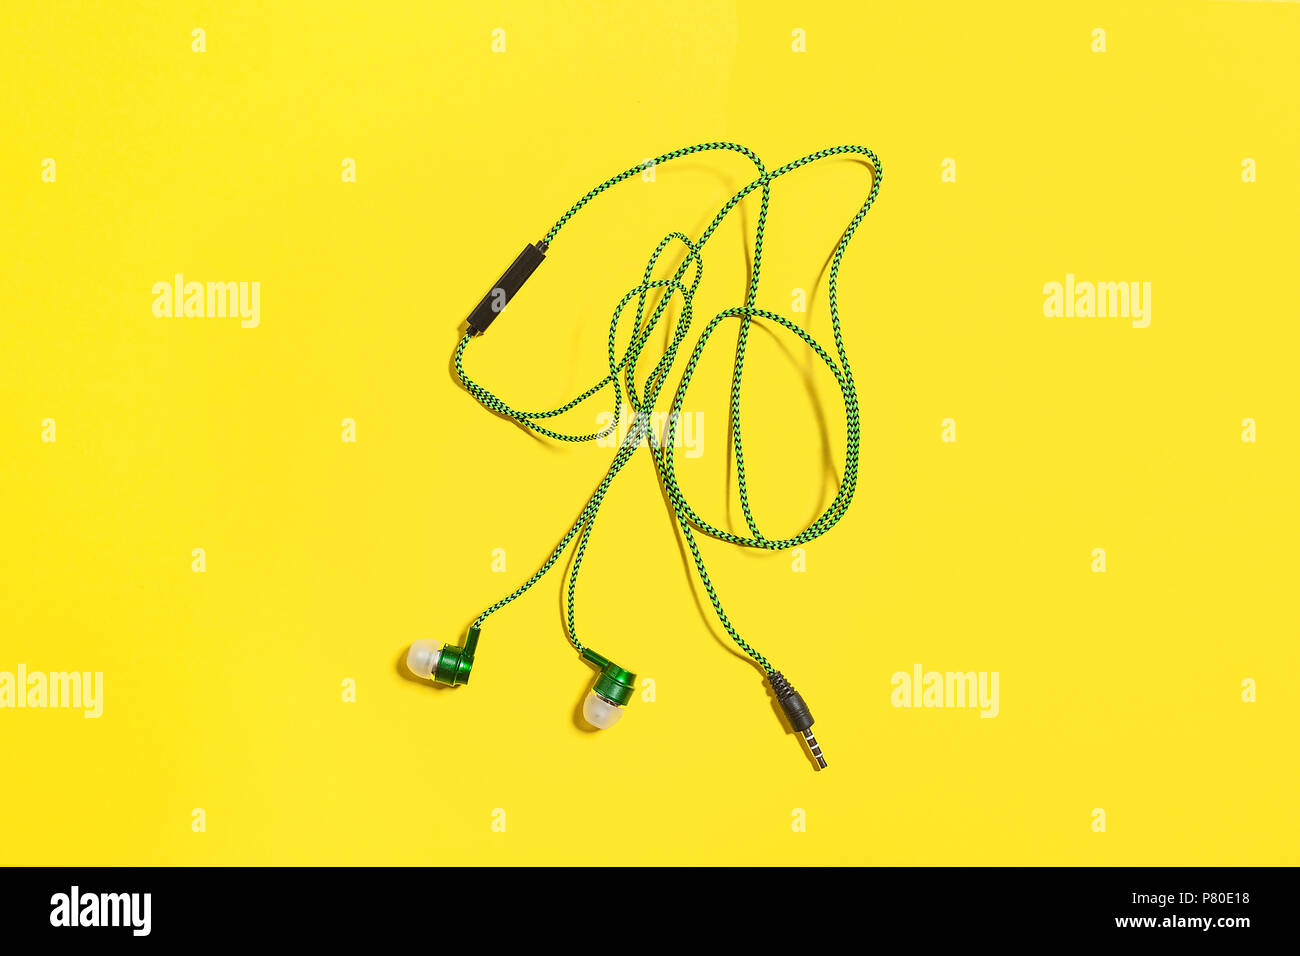 green earphones on a yellow background - Stock Image